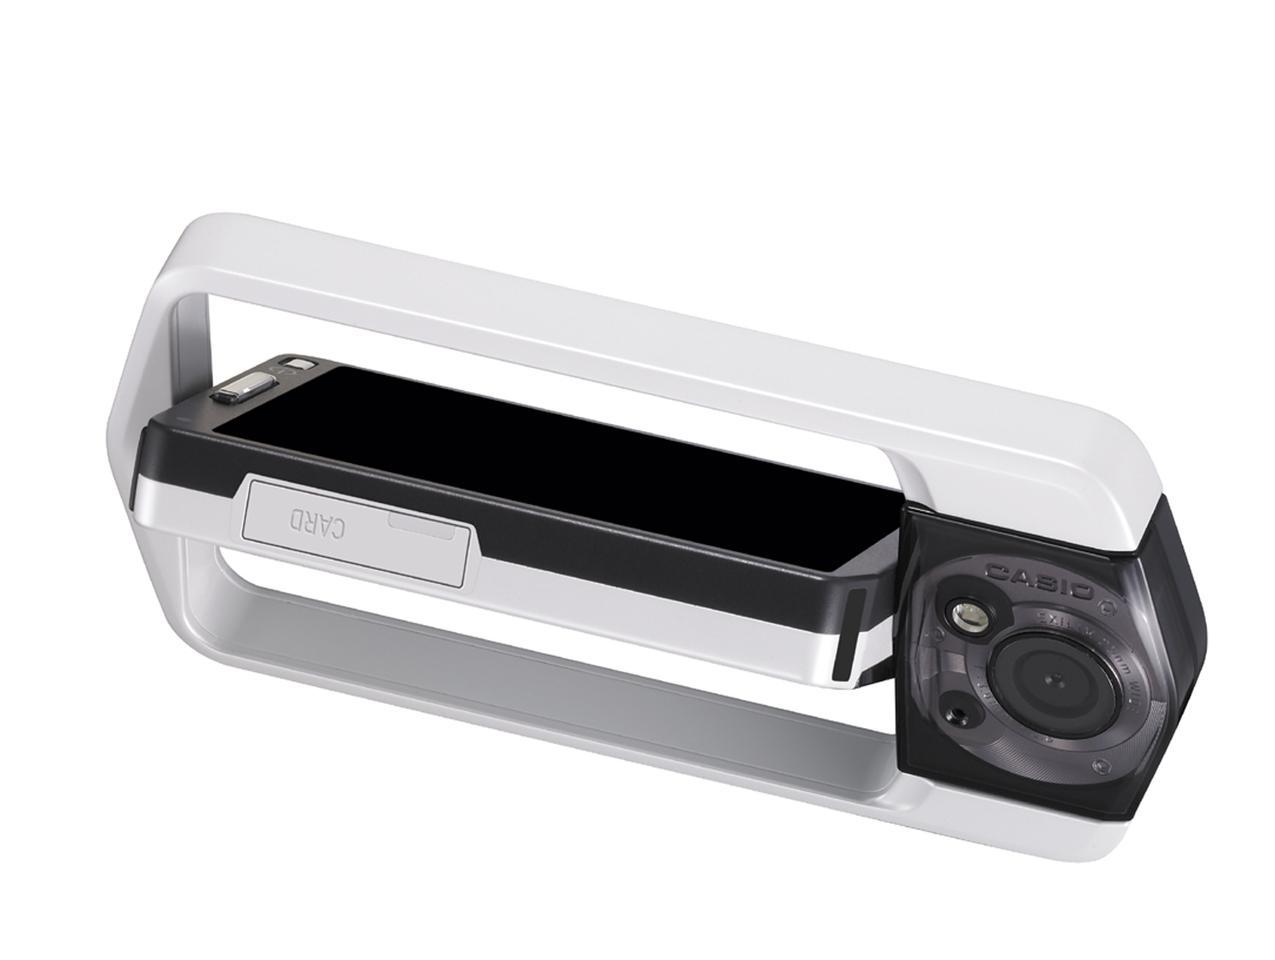 Casio's new TRYX camera